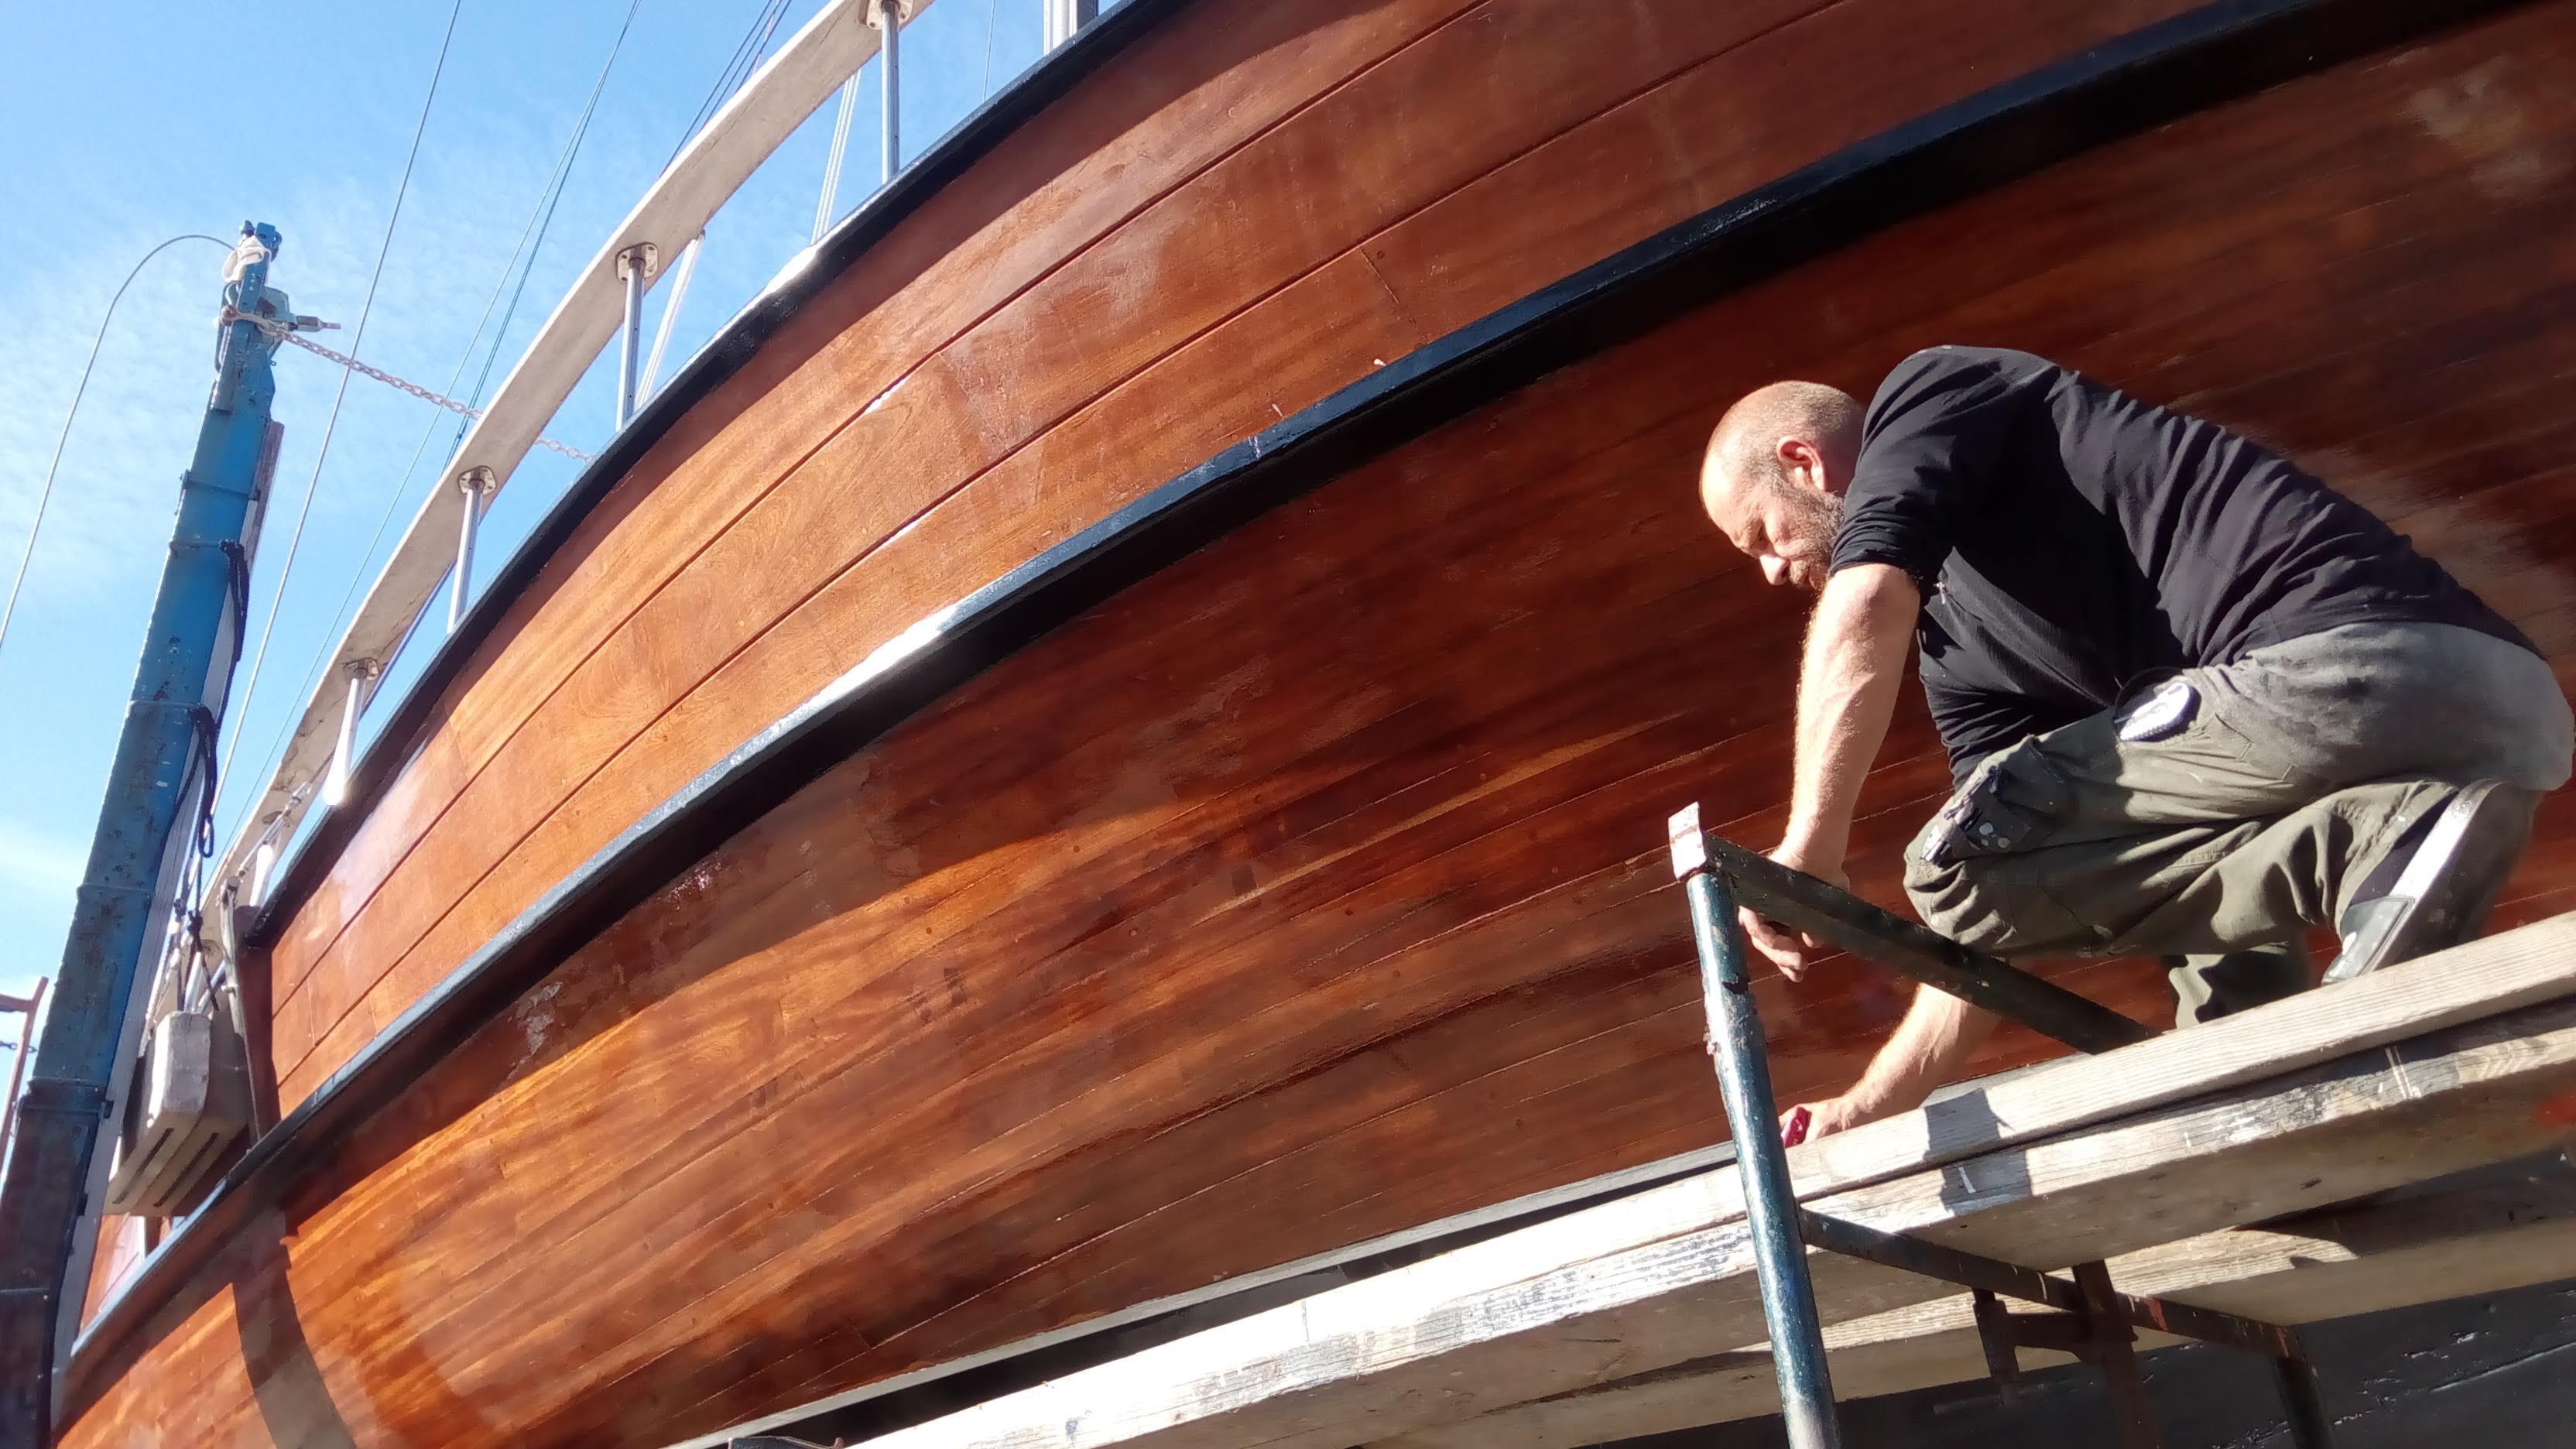 Marlin doing the varnish work